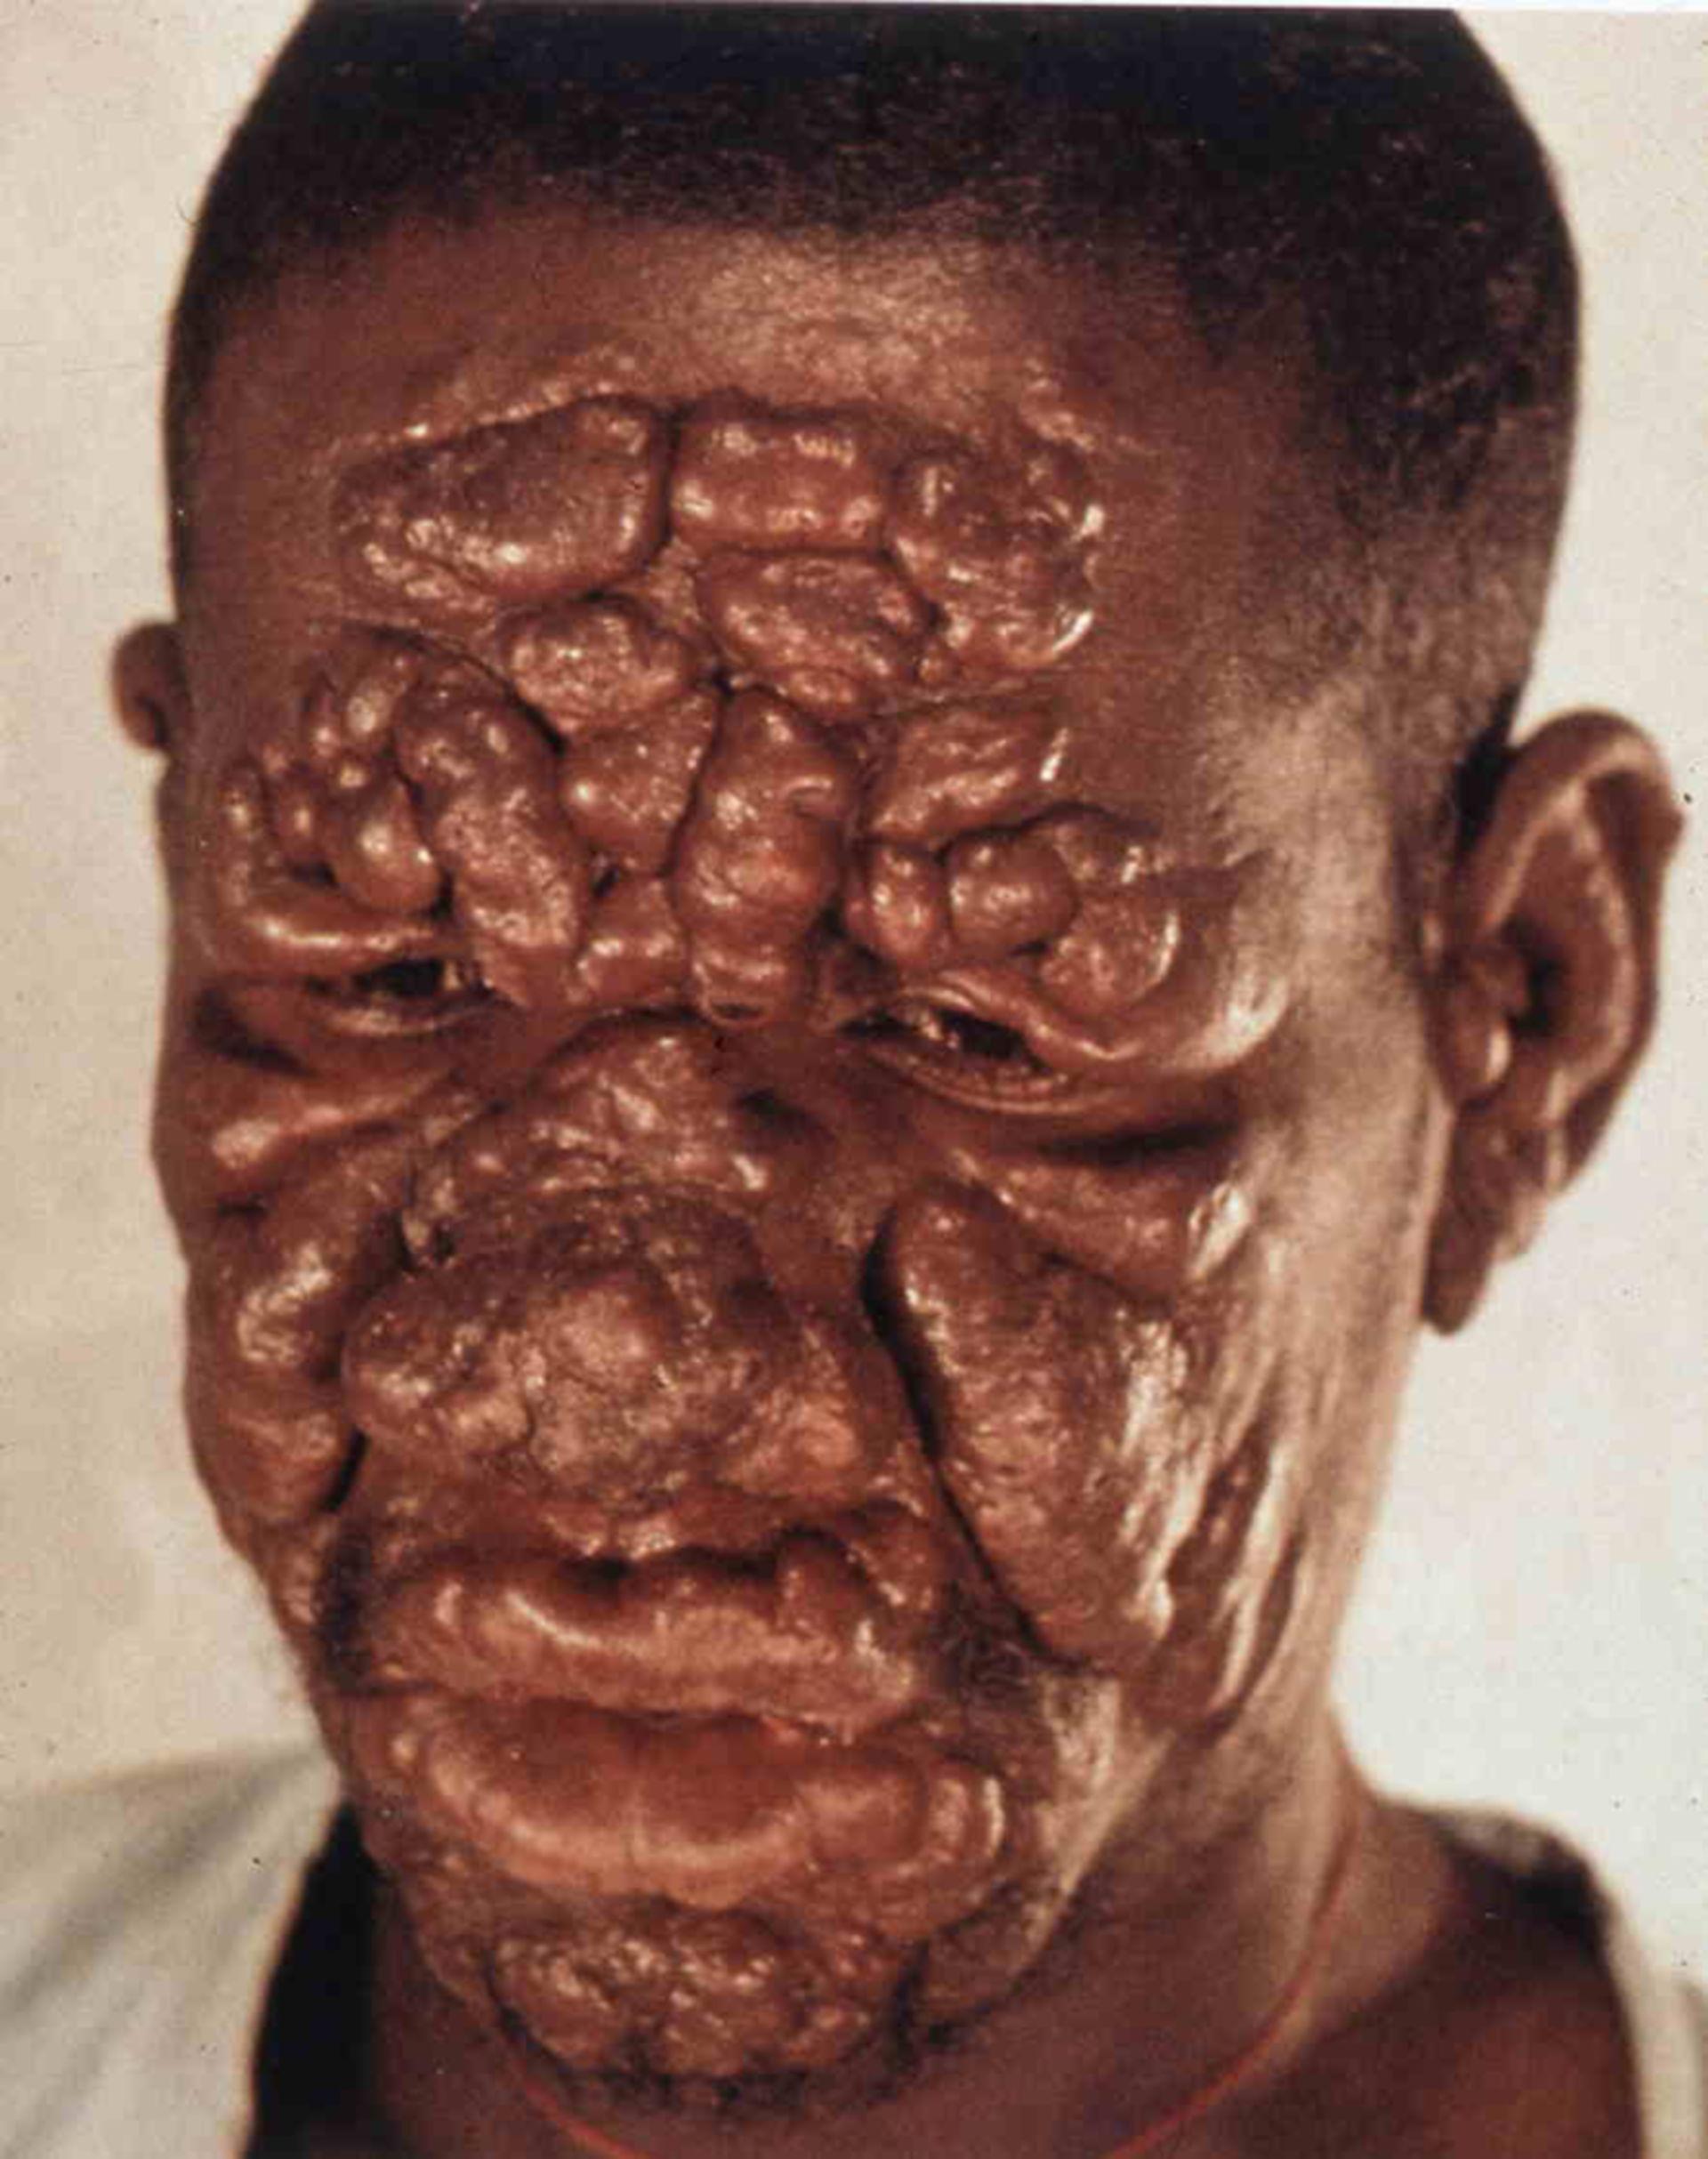 Lebbra borderline infezione lepromatous  Lebbra